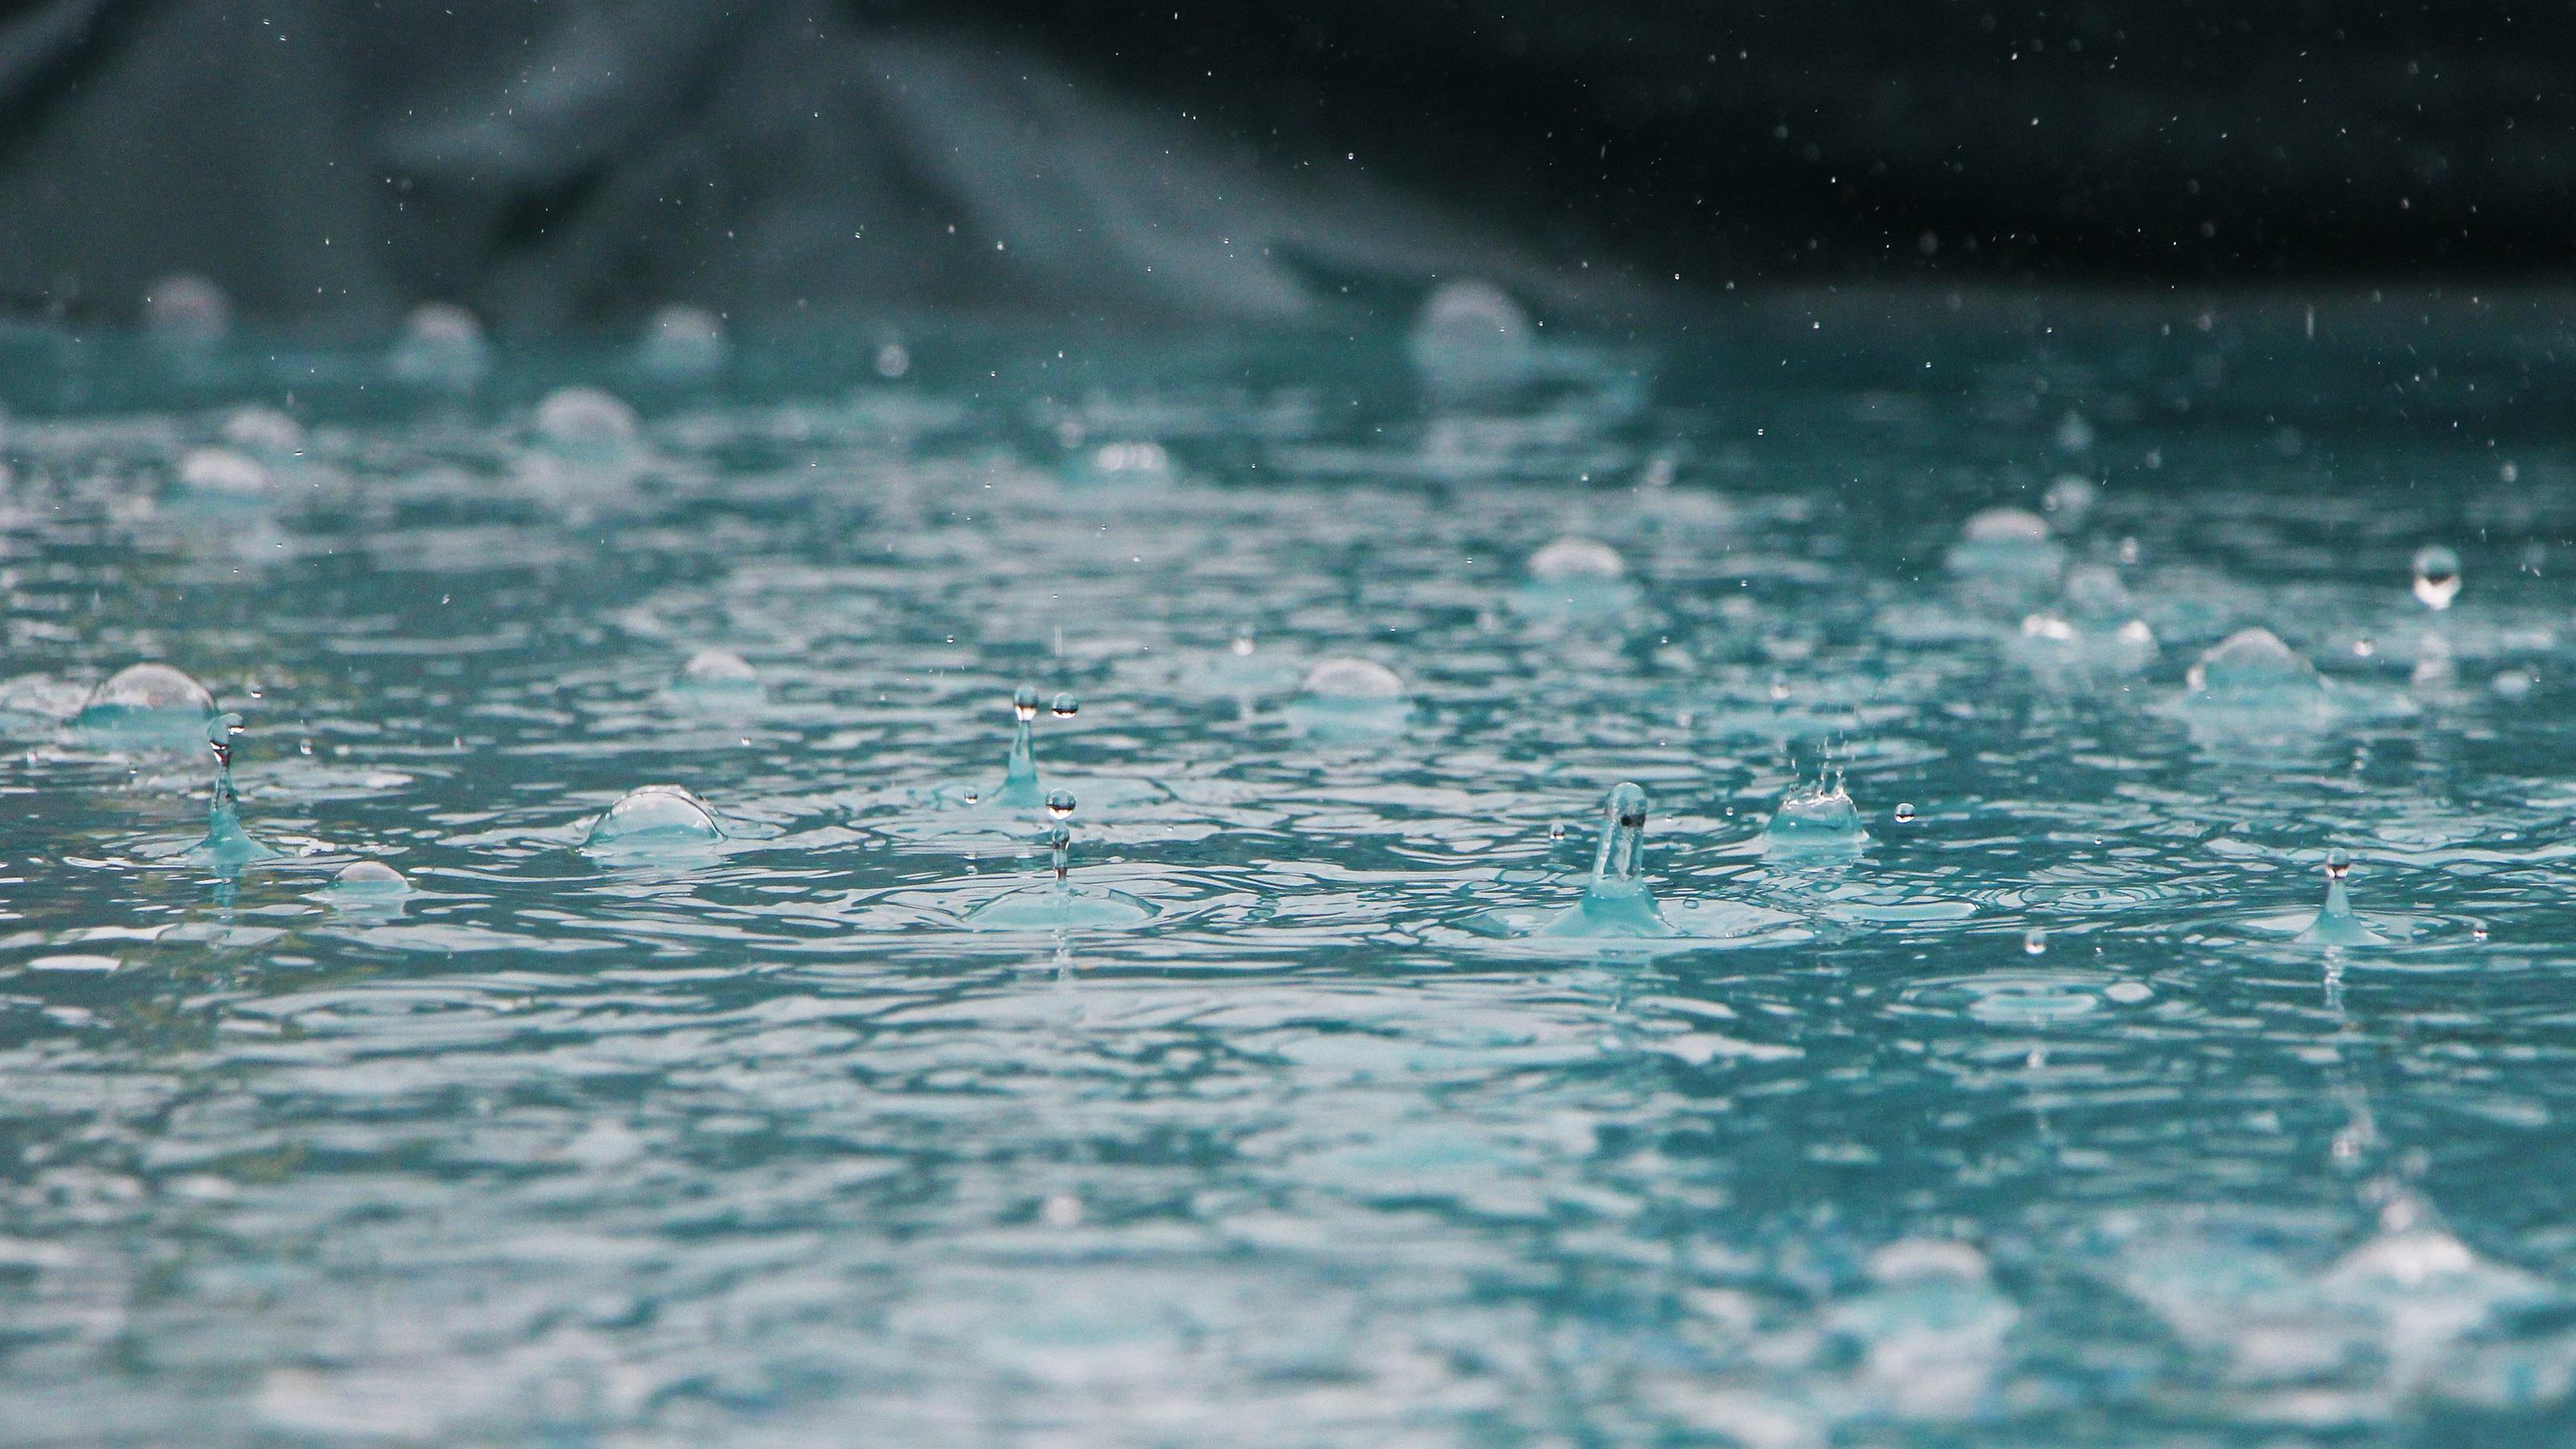 Rainout postpones Bryce Harper's latest return to Washington